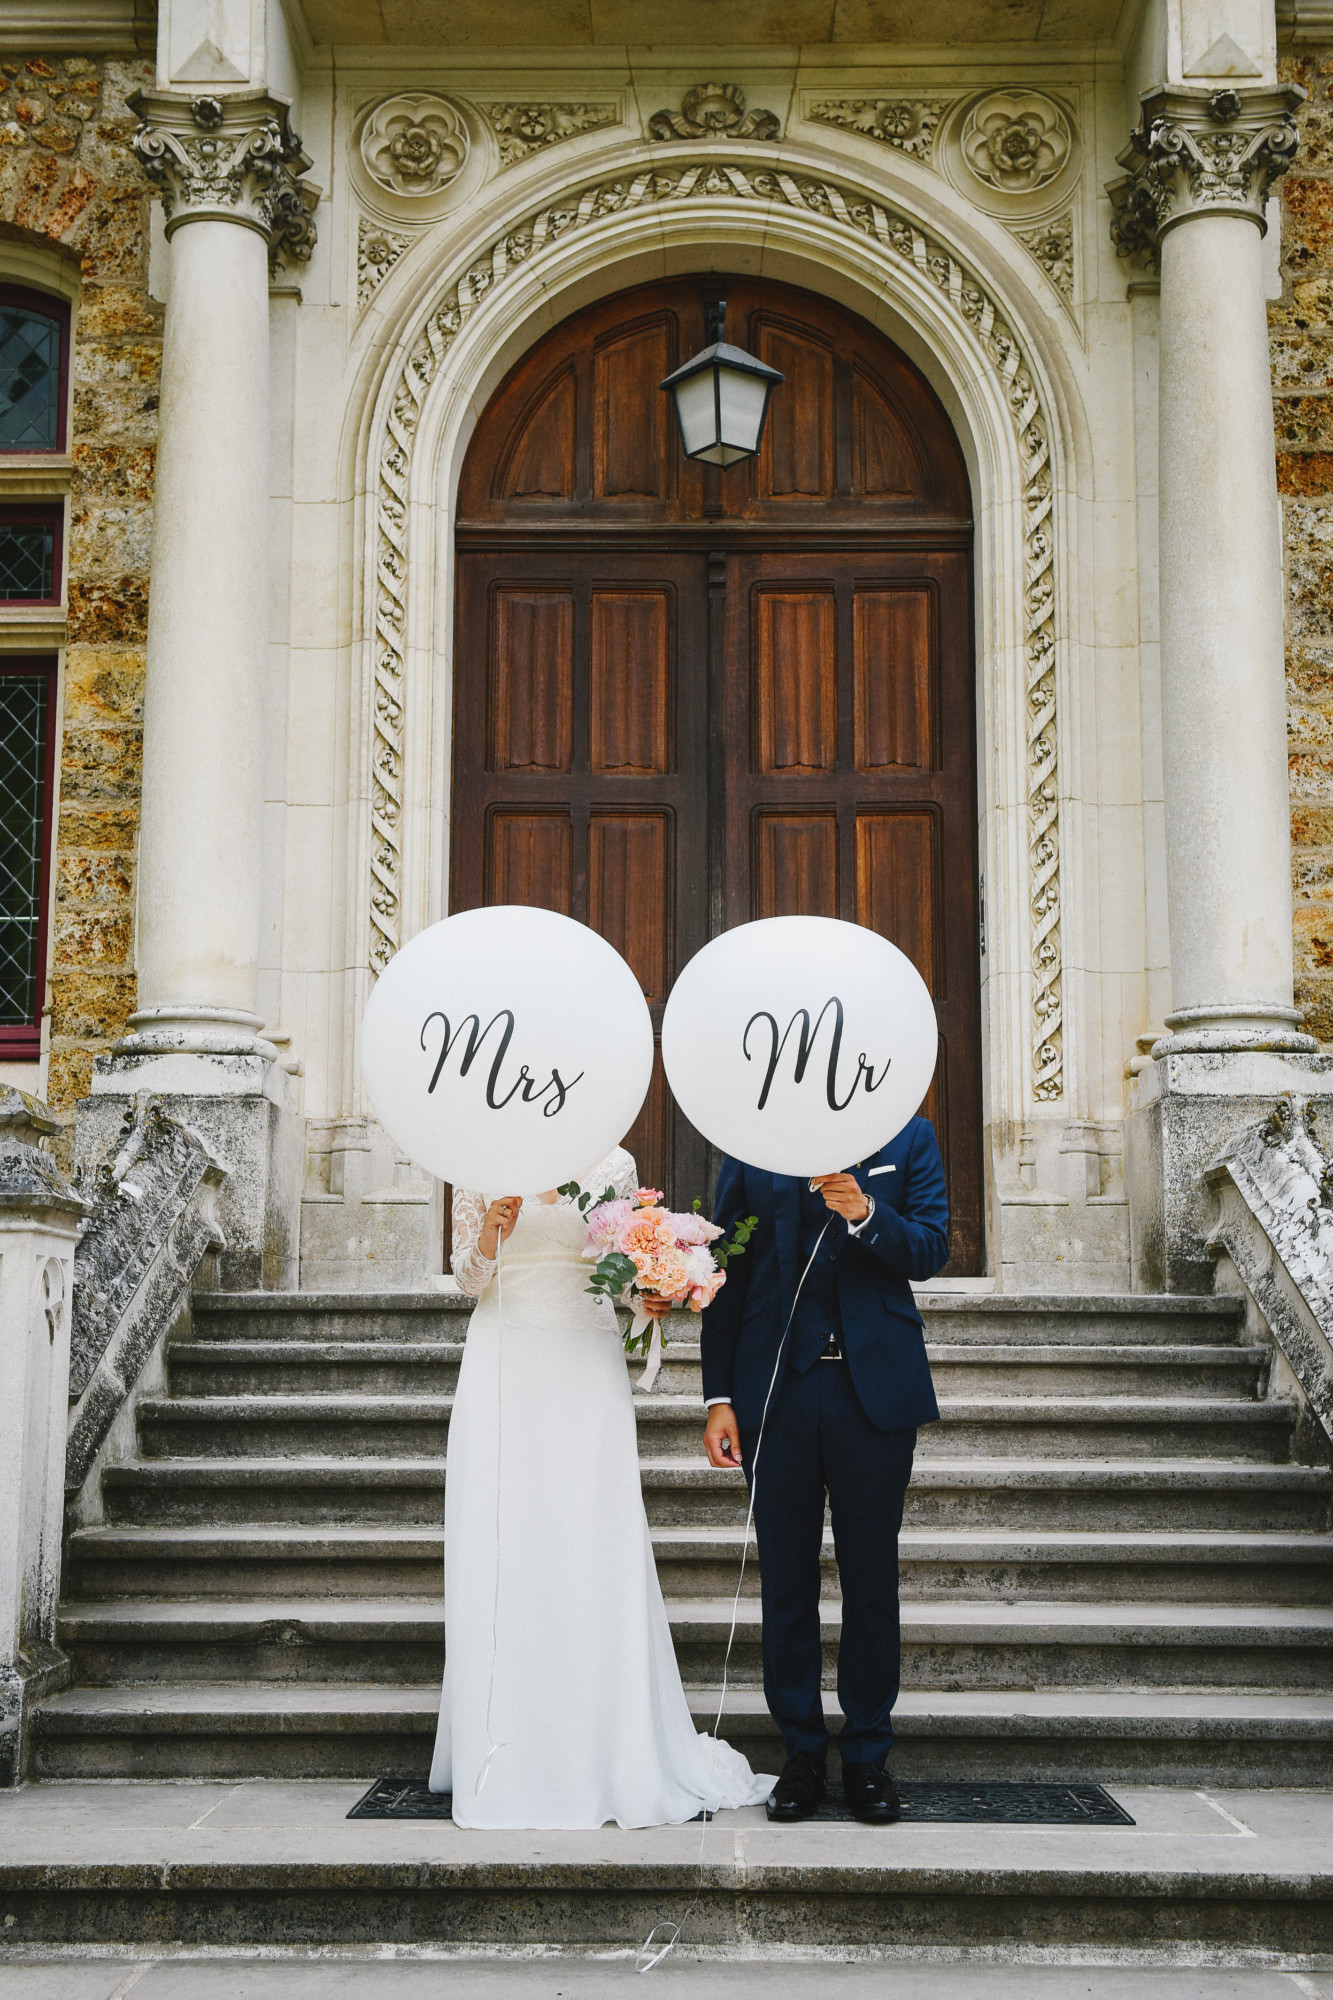 Coaching, mariage, décoration, fleuriste mariage